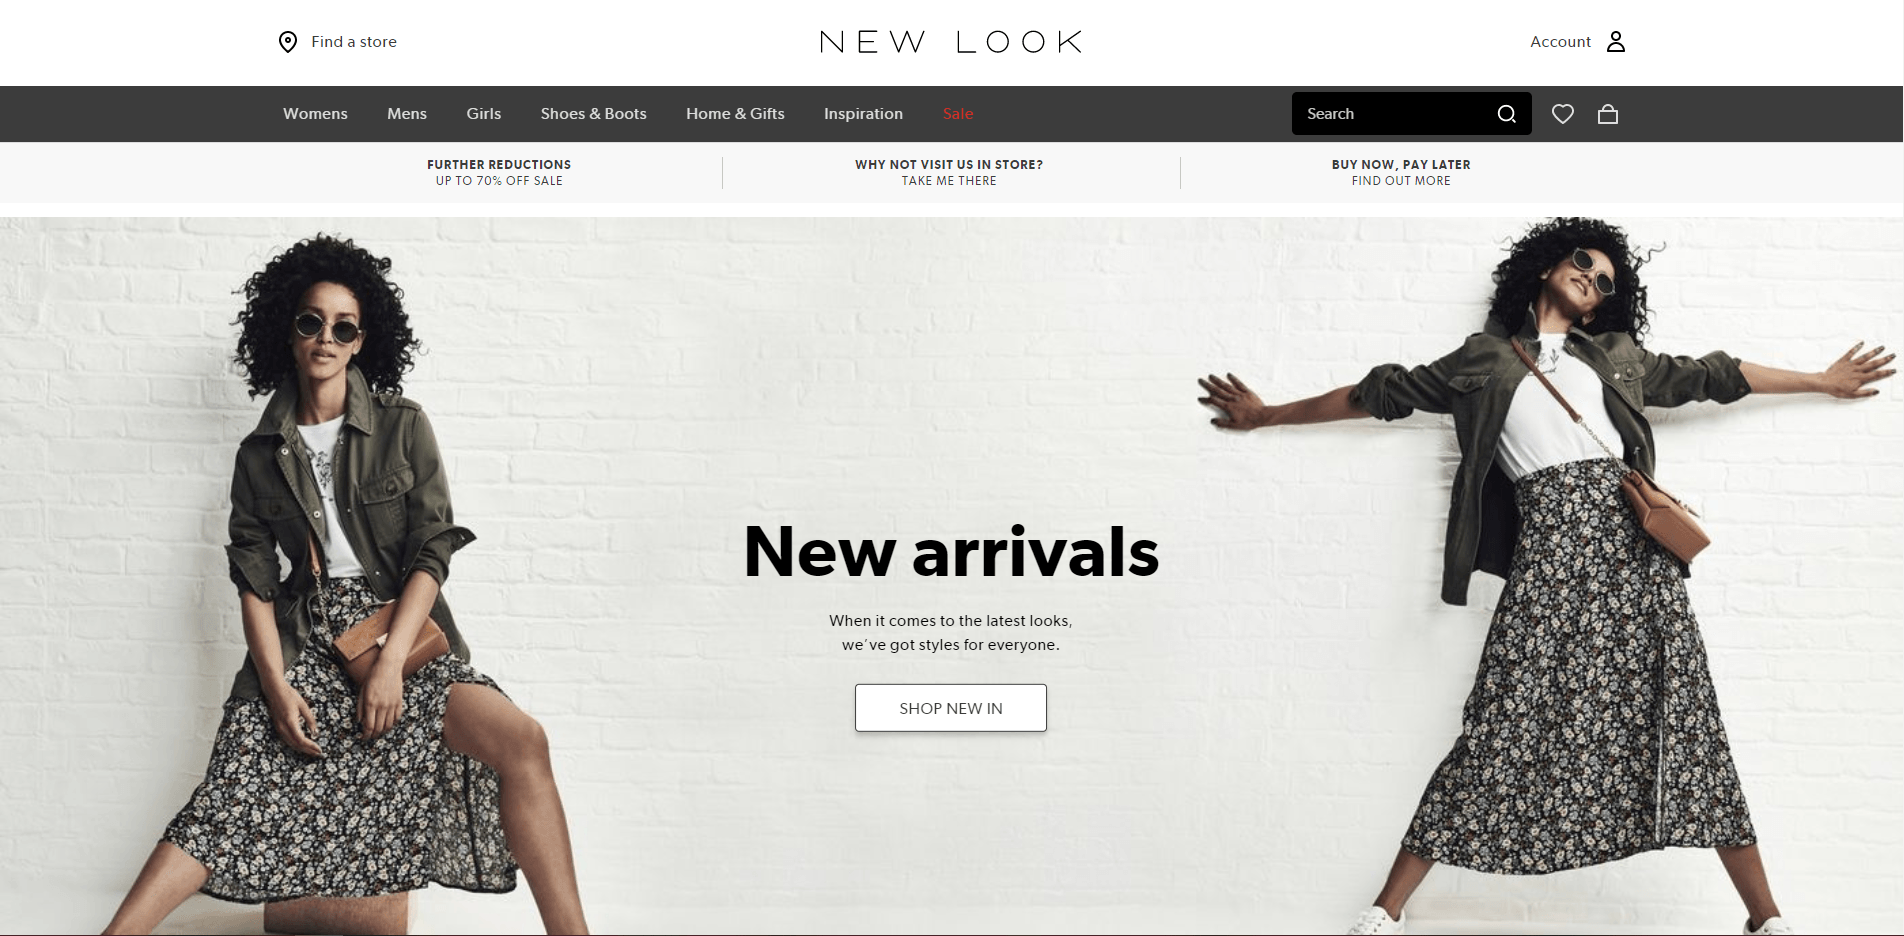 Newlook website's picture